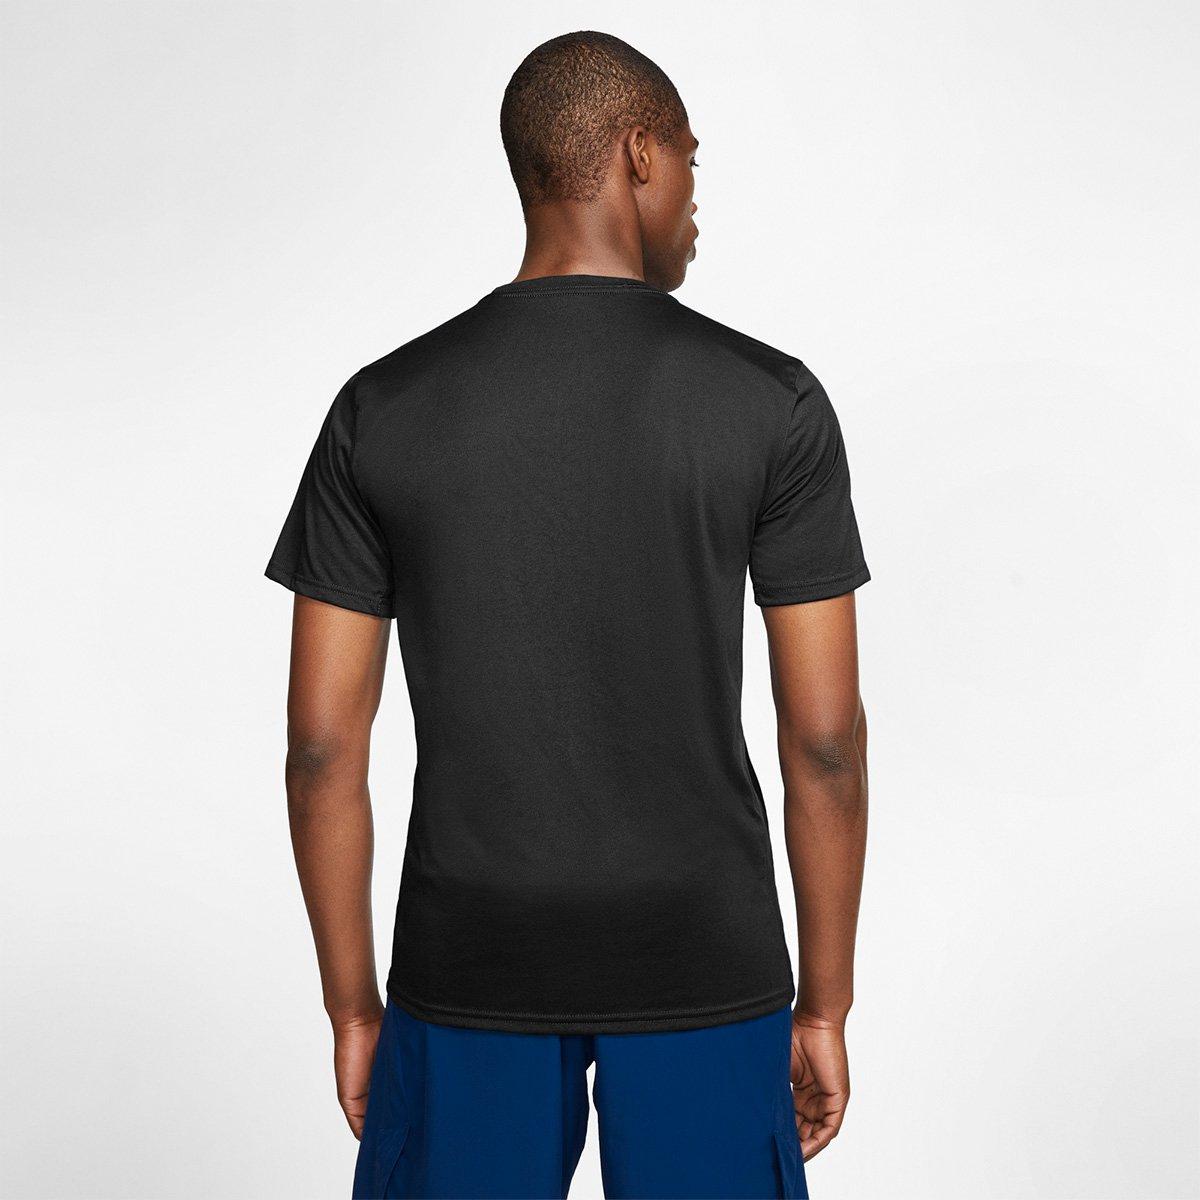 Camiseta Nike Legend 2.0 Ss Masculina - Tam: GG - 1